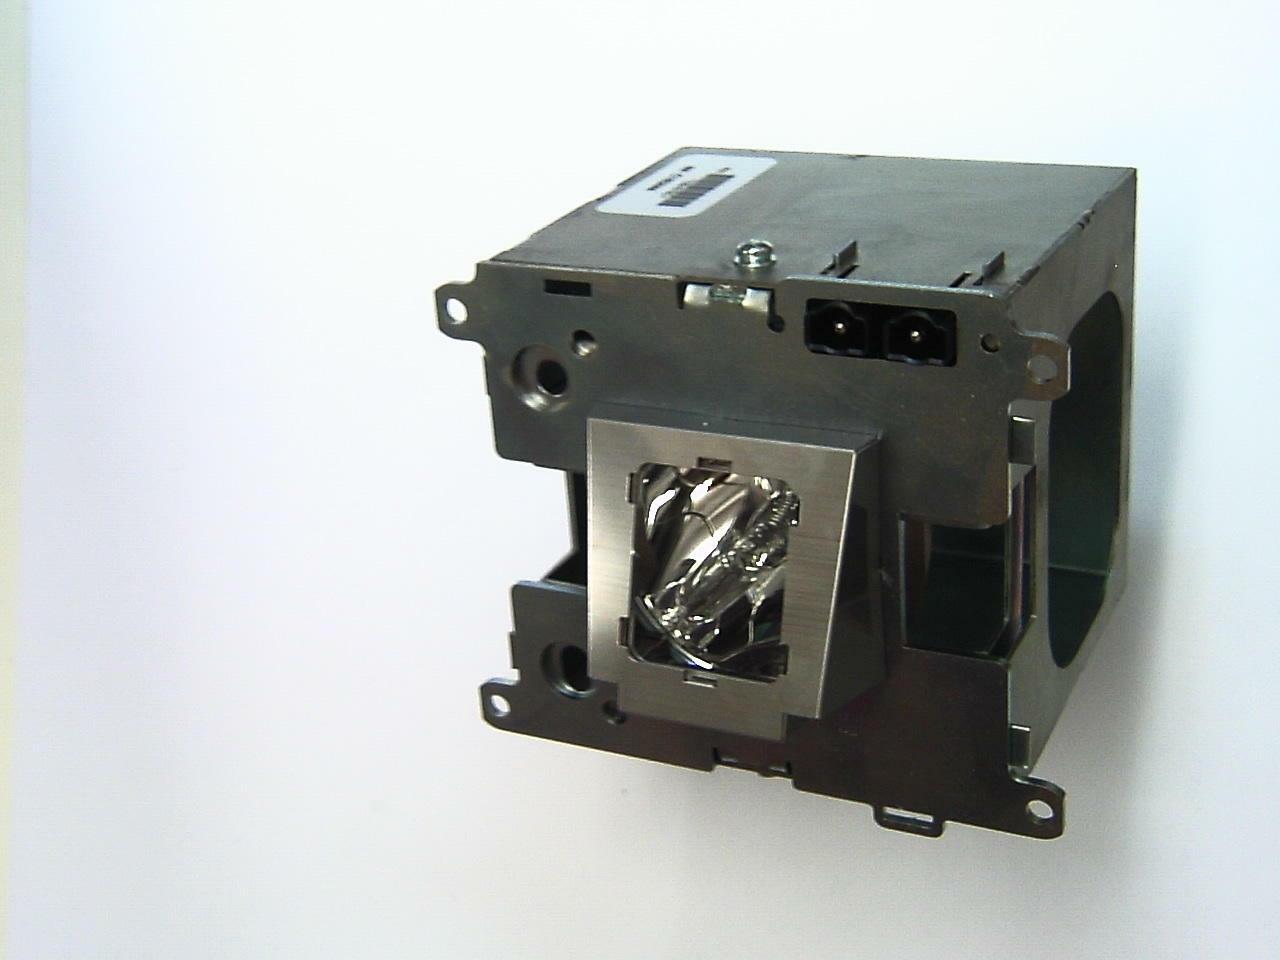 Original Simple Lámpara For DIGITAL PROJECTION TITAN 1080P-600 Proyector.